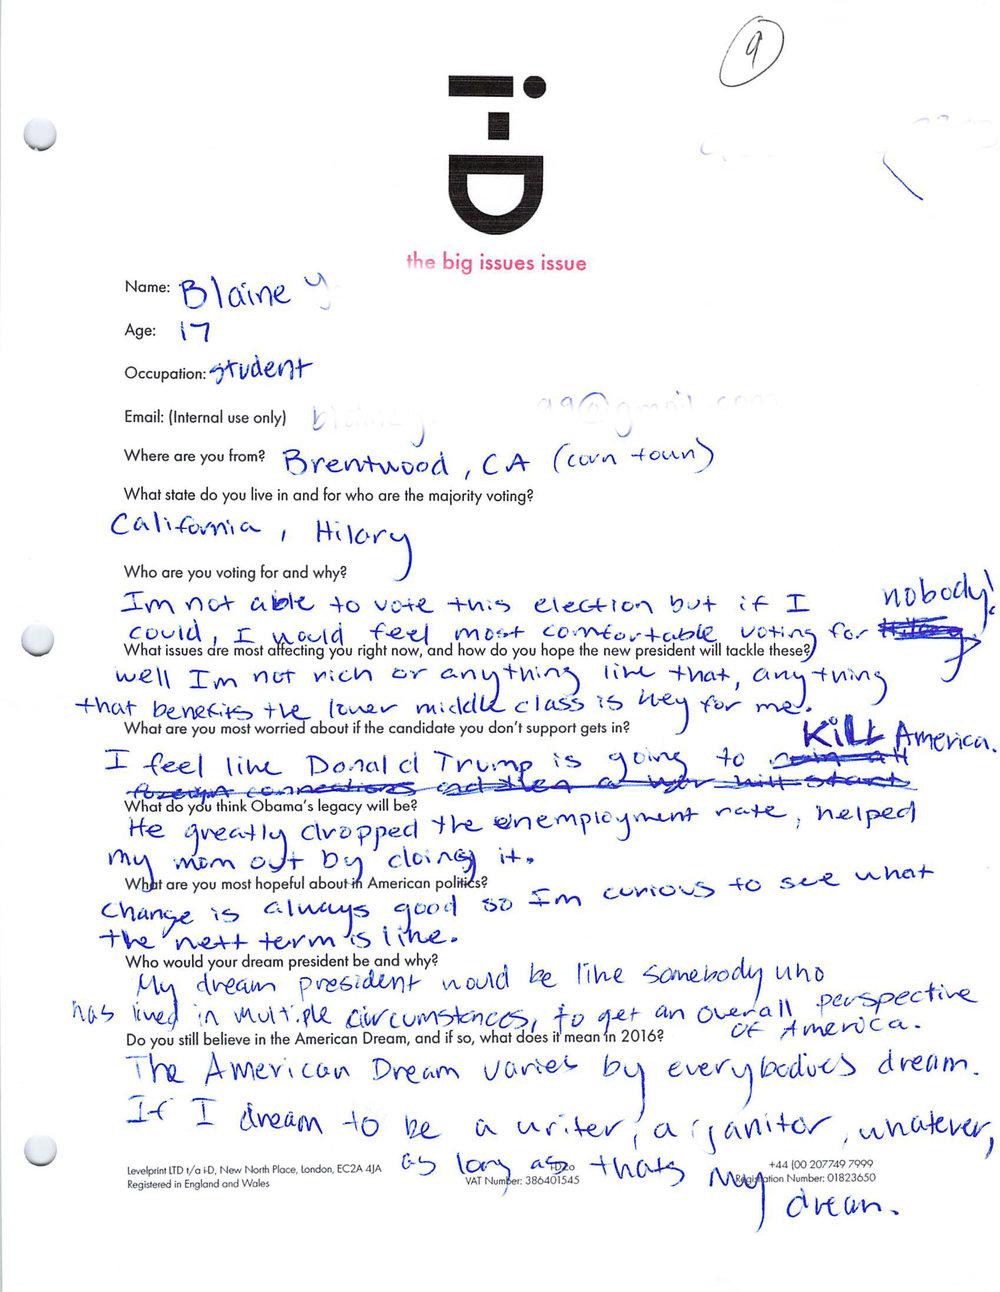 9_Blaine Yoakem-1 copy.jpg